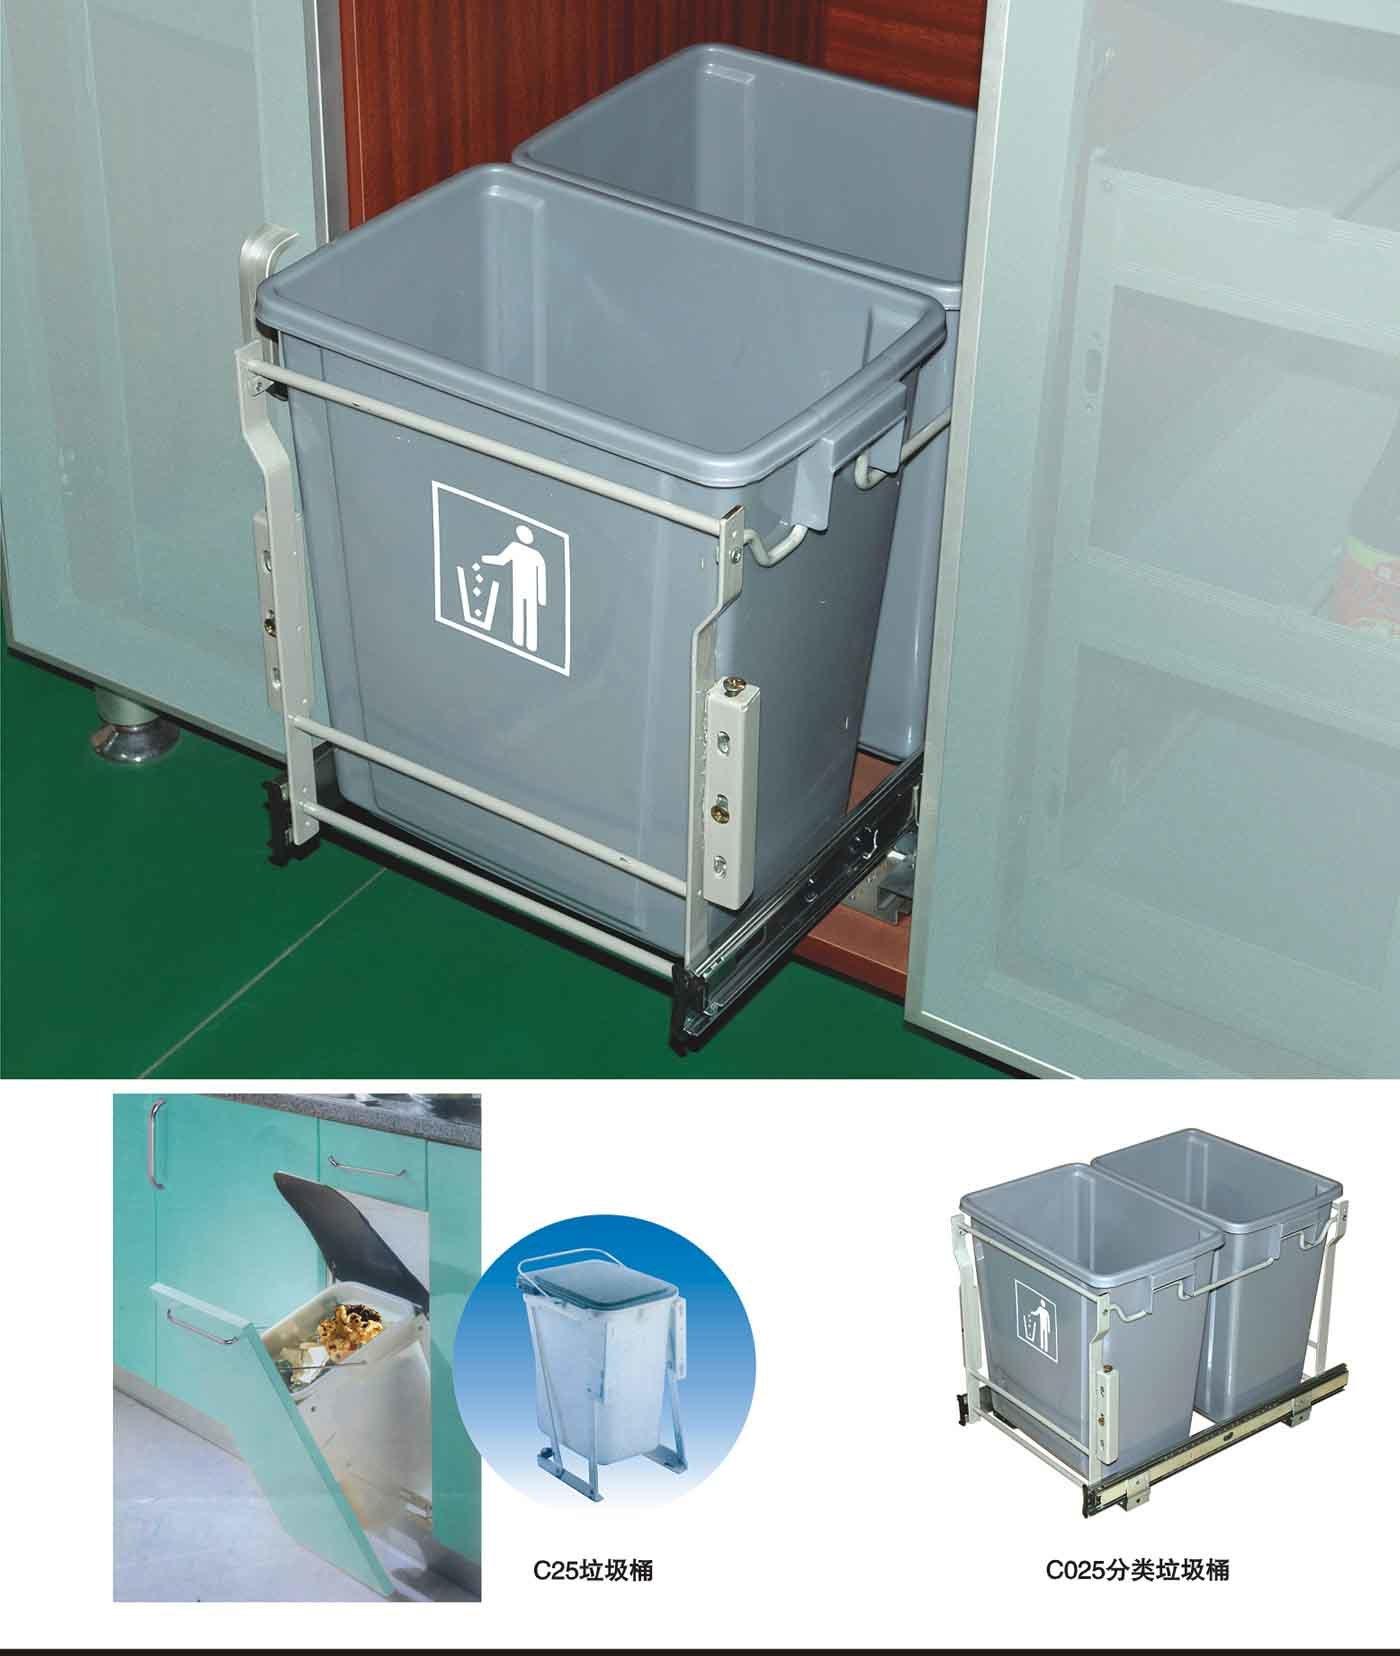 Kitchen Accessories China: China Kitchen Accessories (C025)